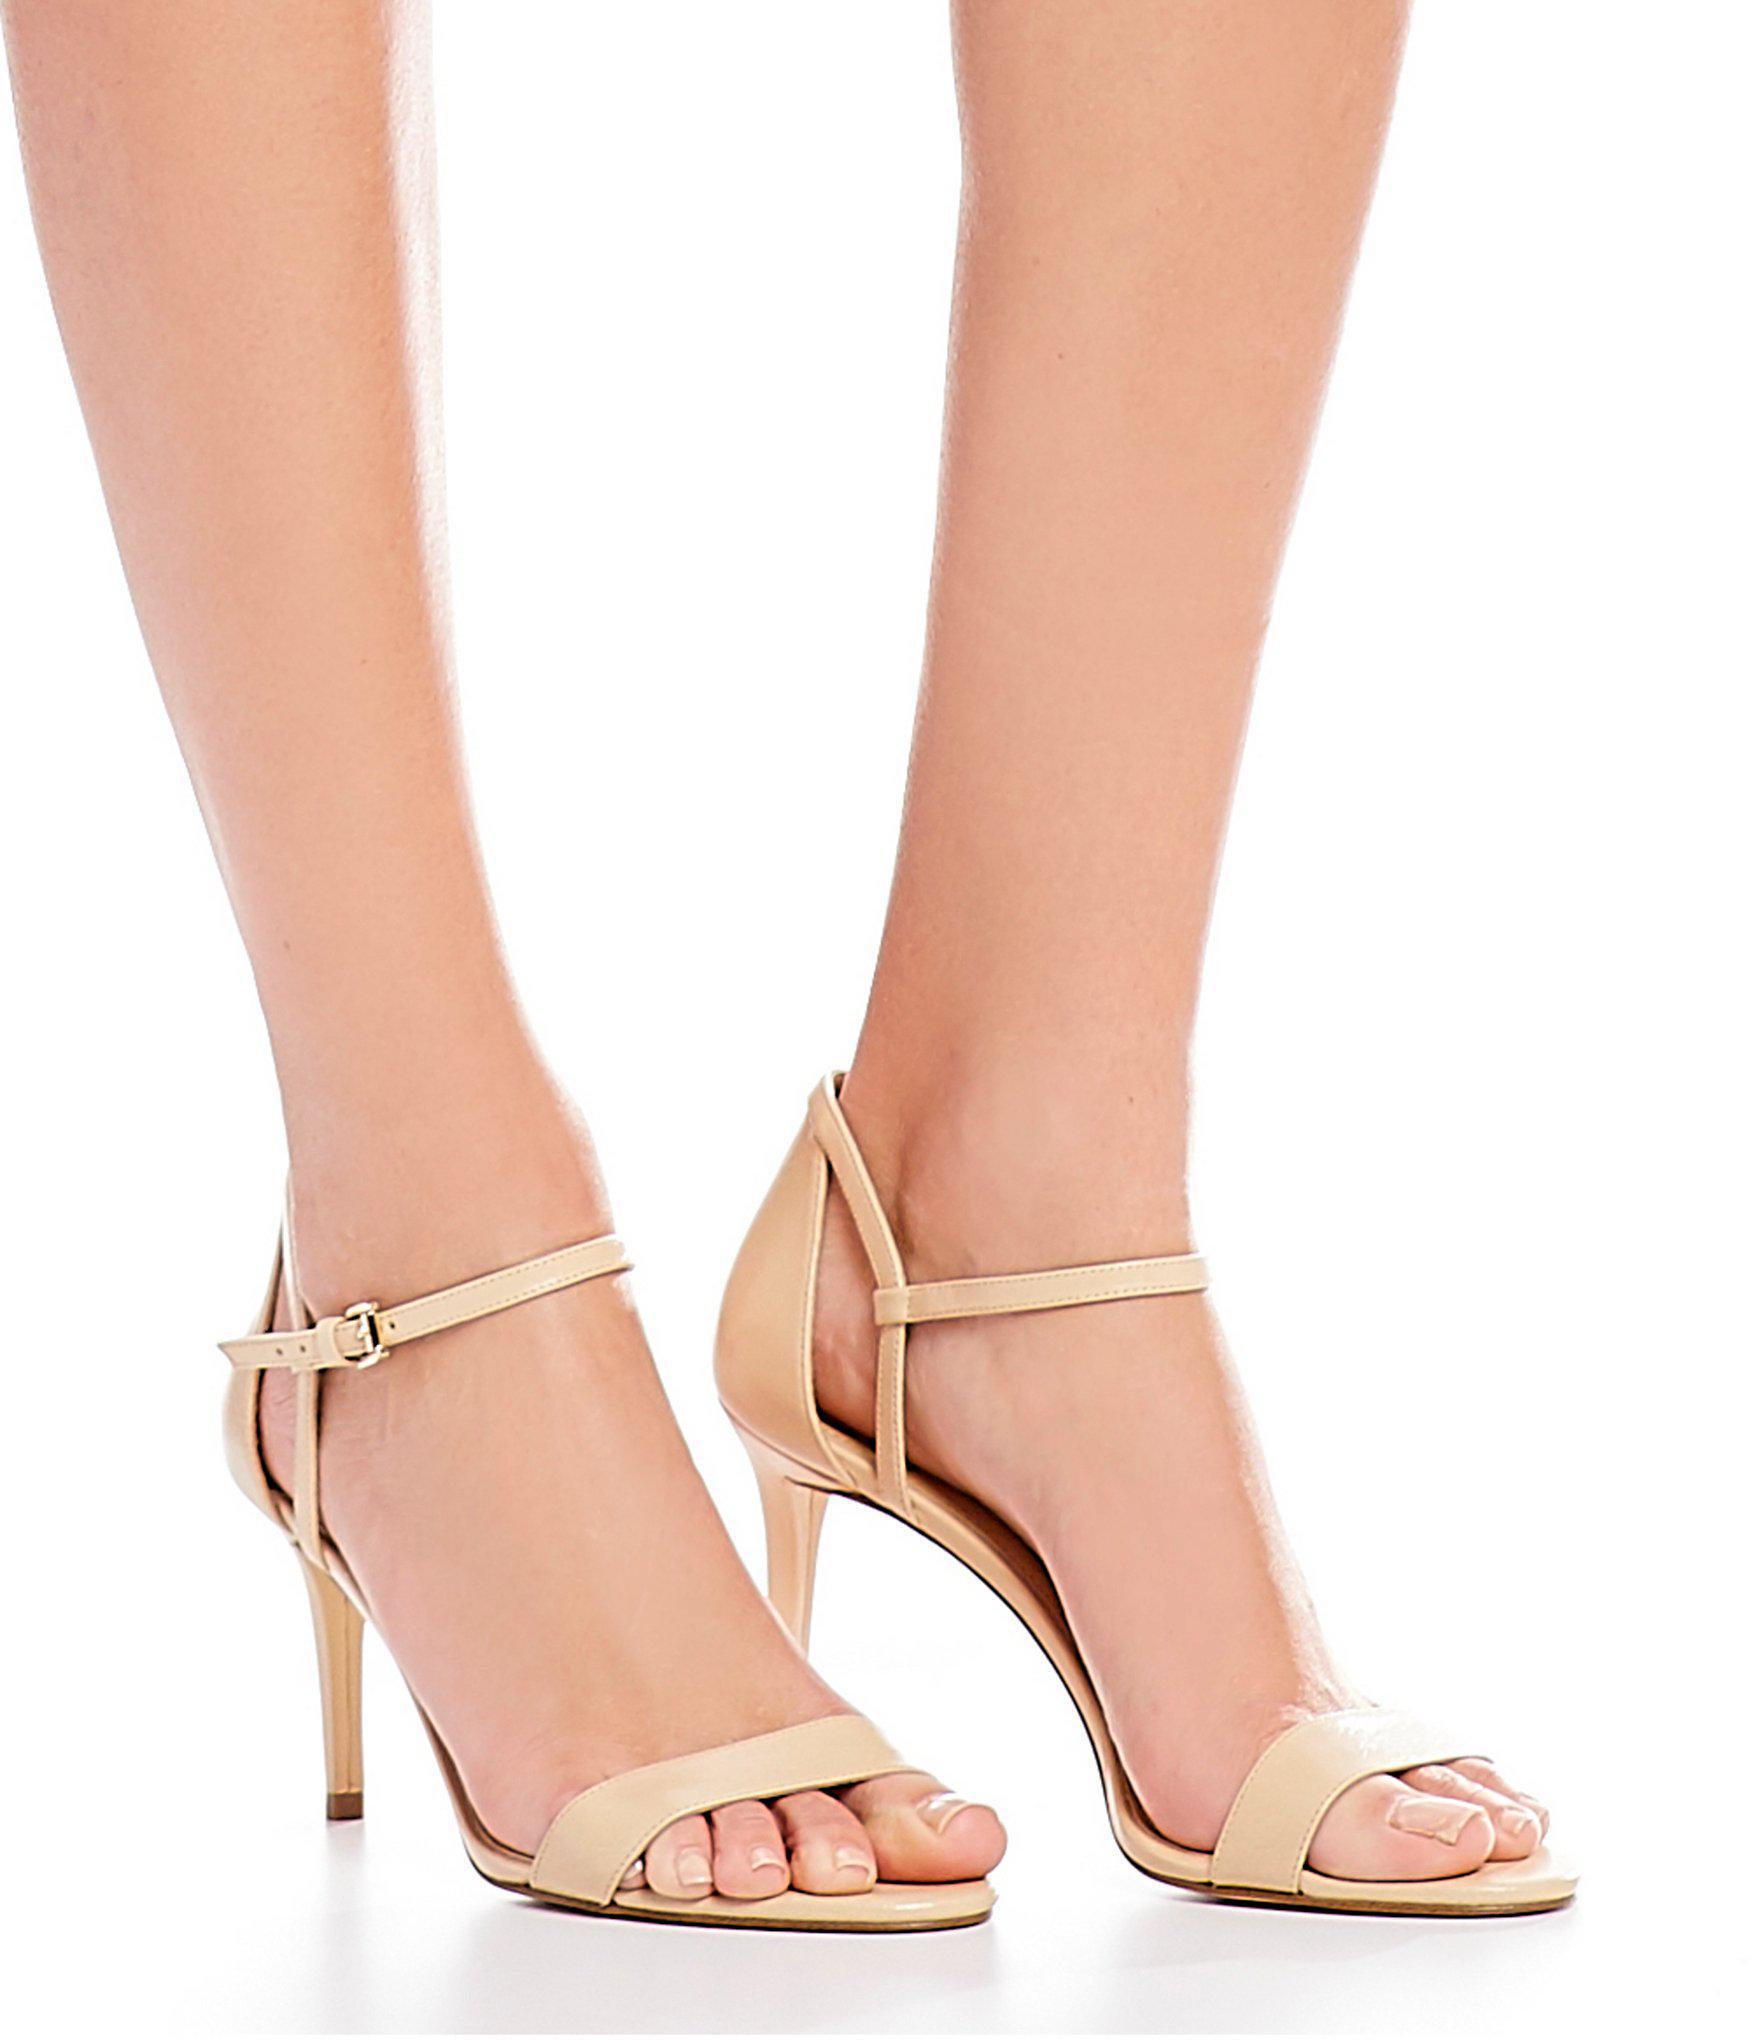 a4c1442851e3 Lyst - MICHAEL Michael Kors Simone Mid Dress Sandals in Natural